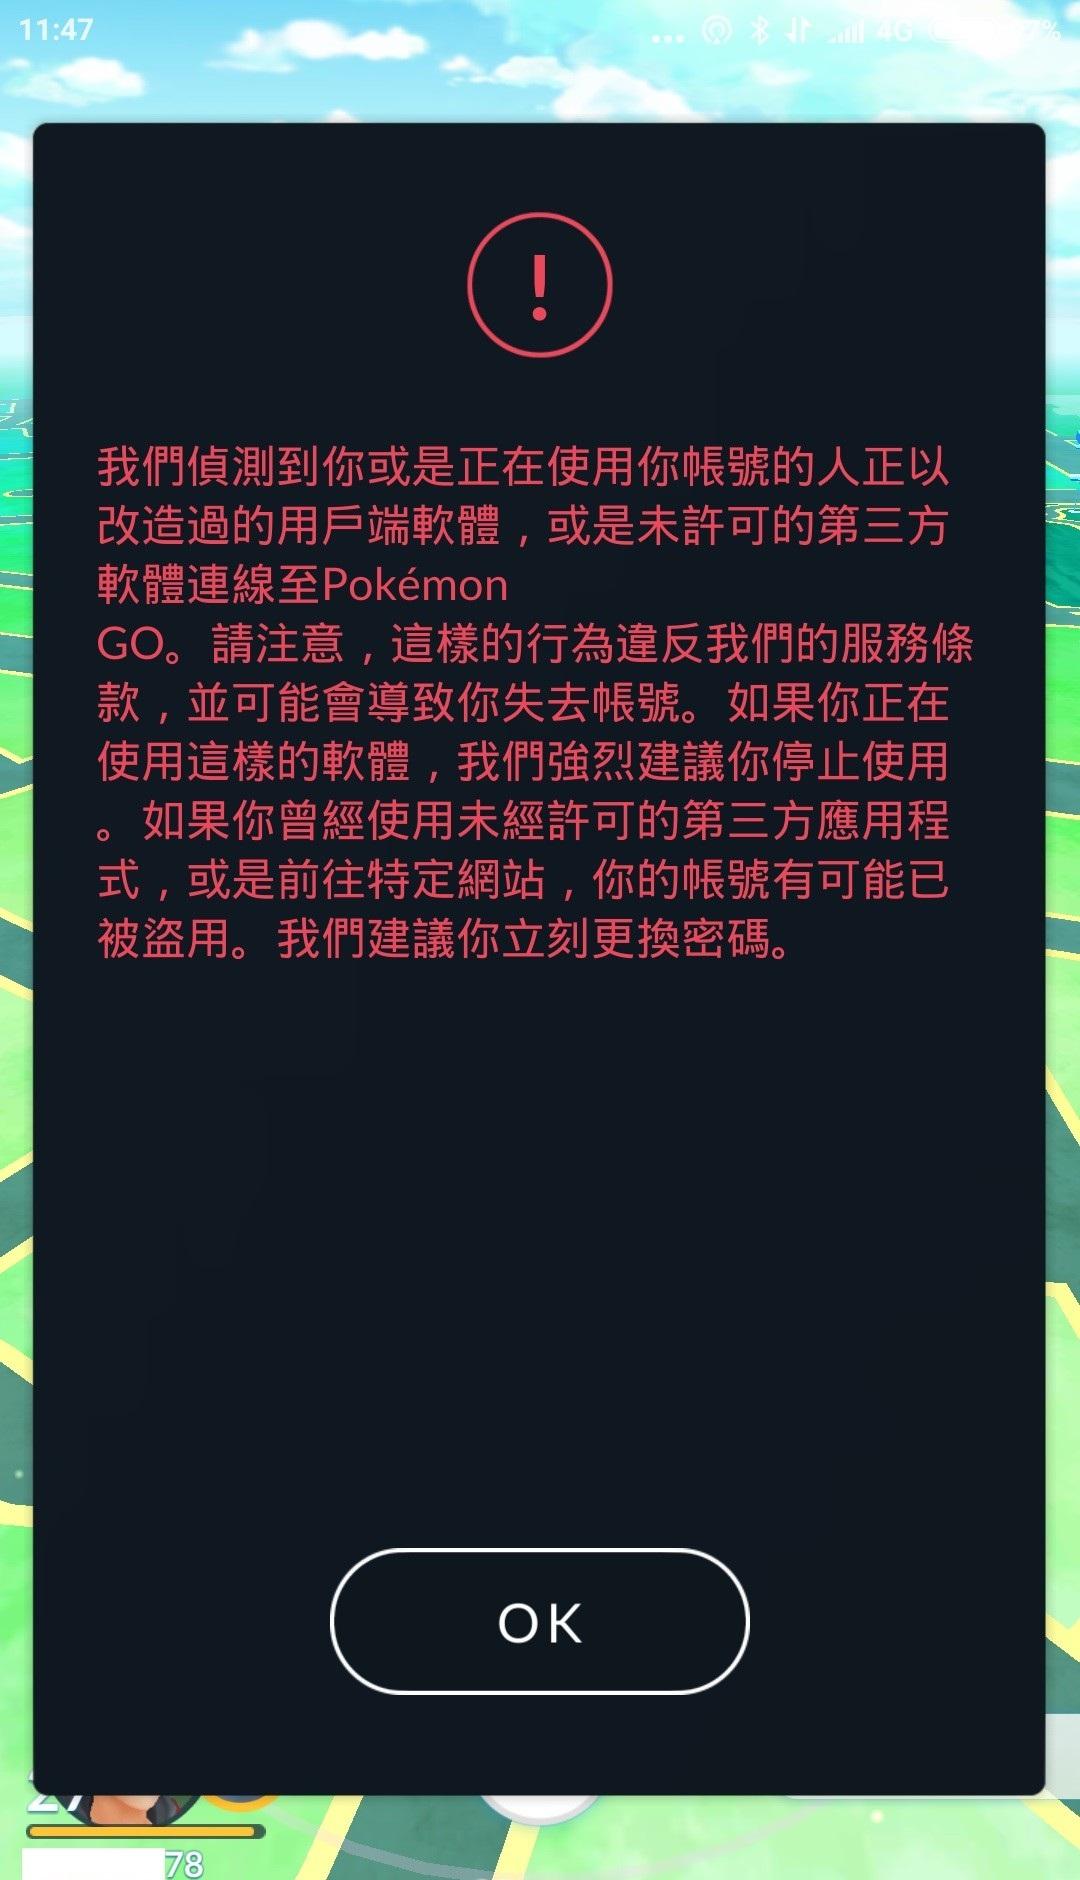 POKEMONGO 官方正式警告函 飛人末日,你出現黑畫面了嗎? - Pokémon GO 精靈寶可夢 - 冰楓論壇 - 綜合論壇.外掛下載 ...